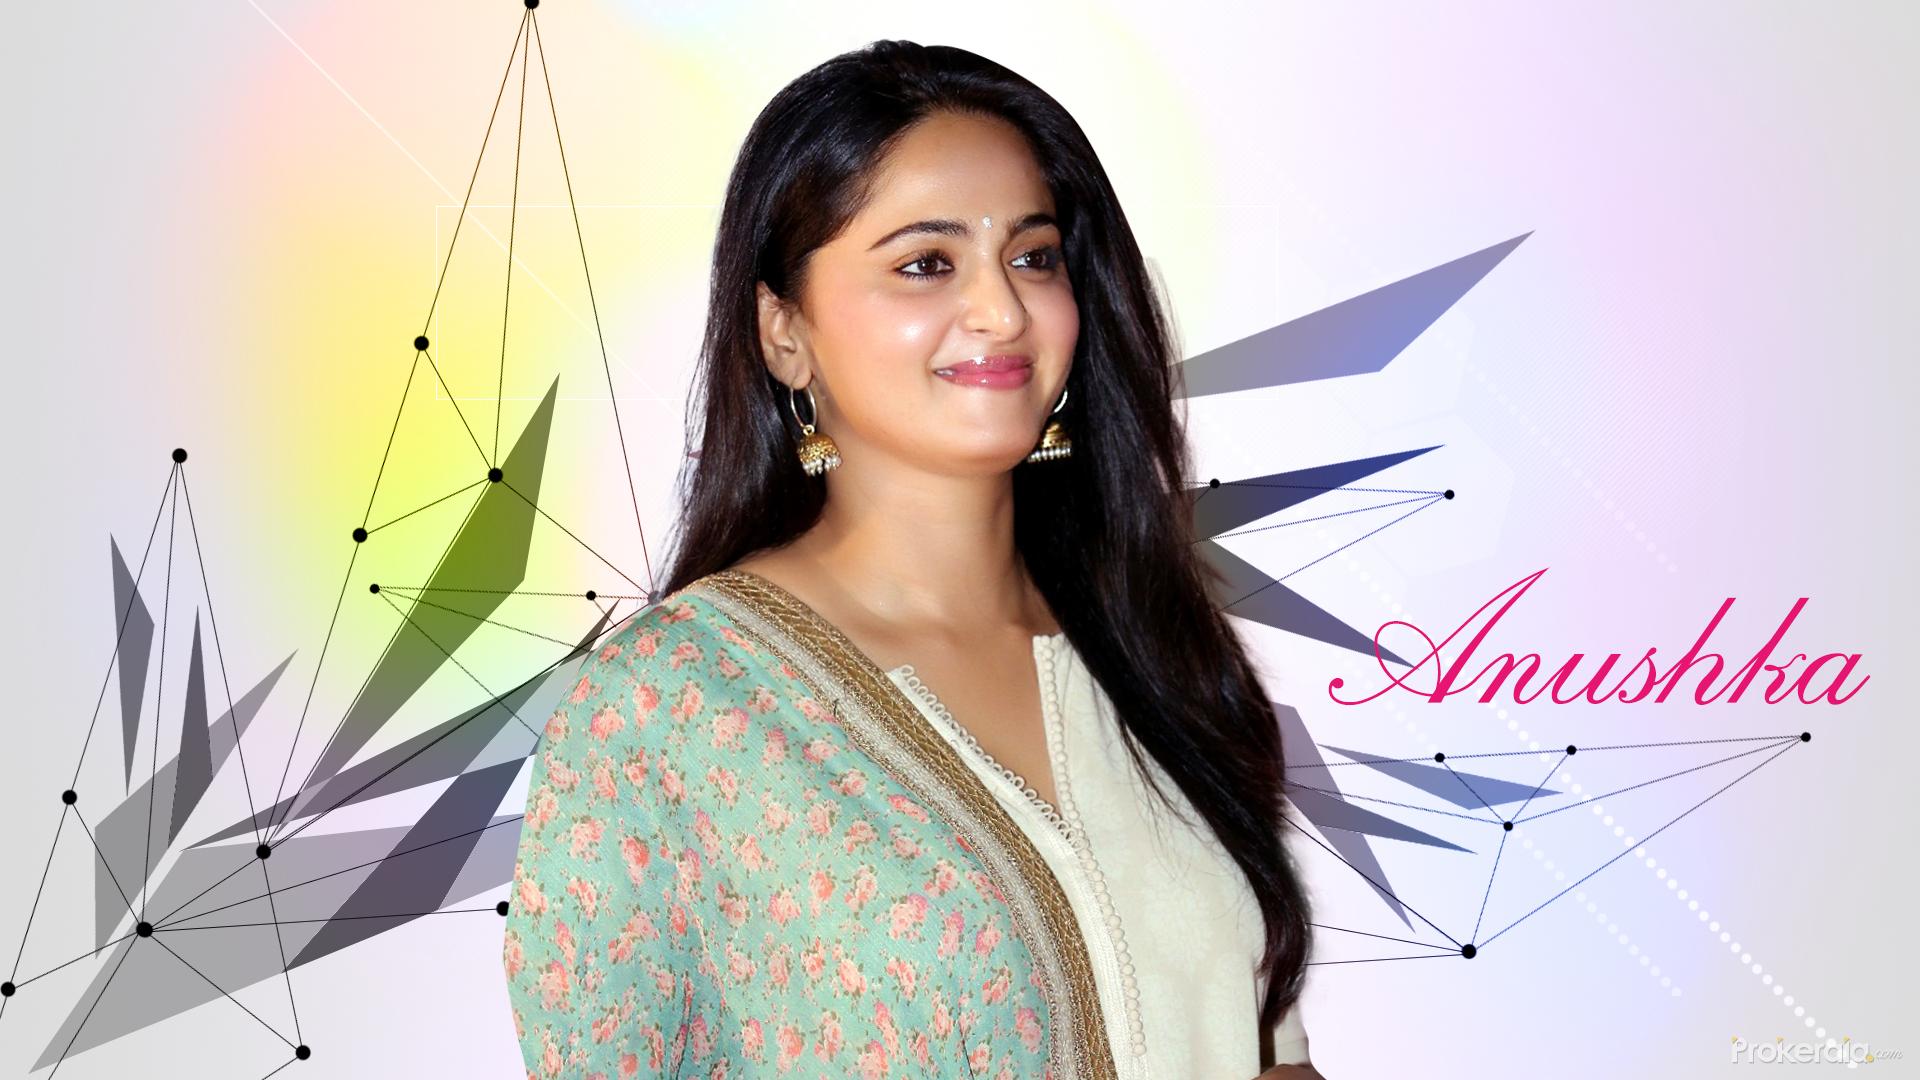 anushka shetty new movie hd rudhramadevi wallpapers